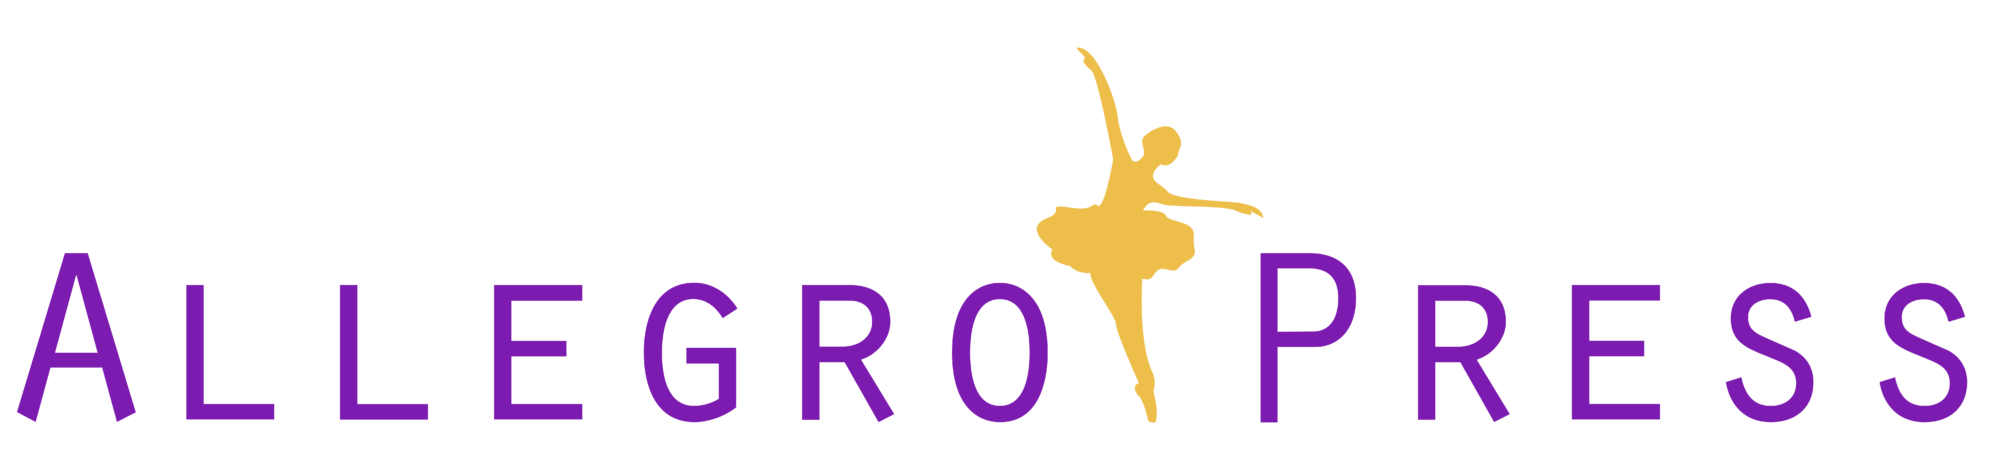 allegropress-logo